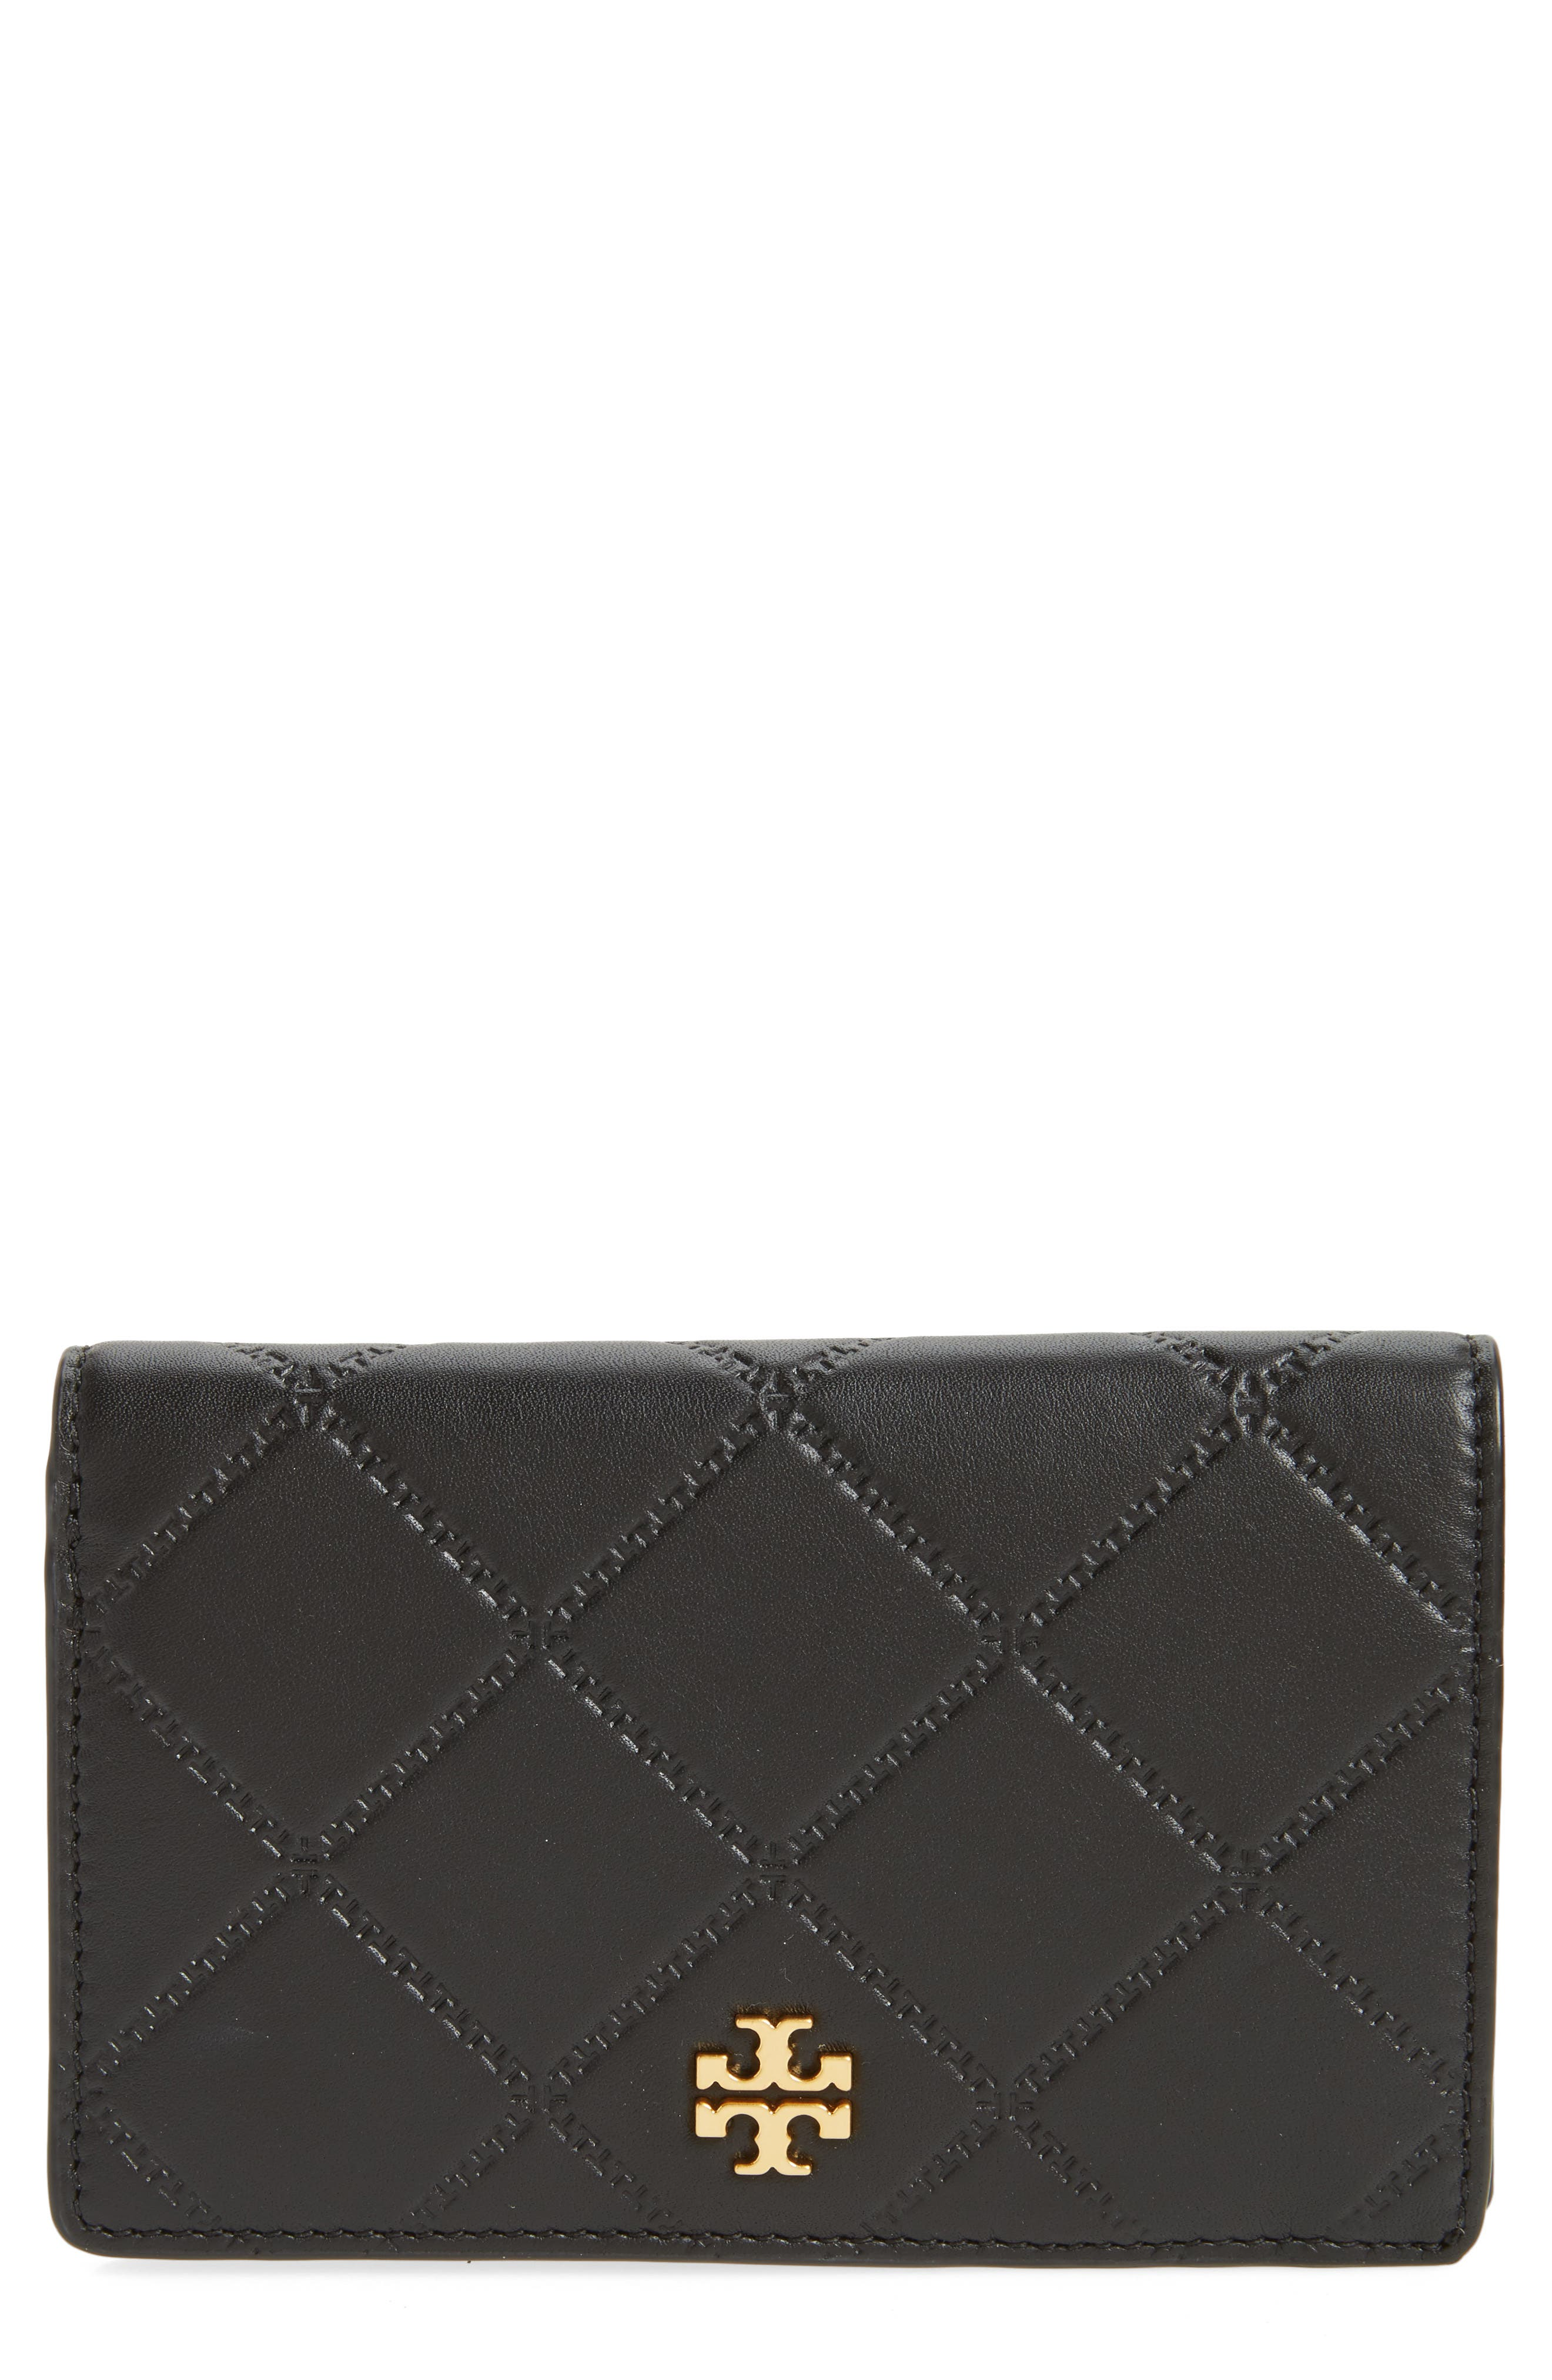 Medium Georgia Slim Leather Wallet,                             Main thumbnail 1, color,                             001